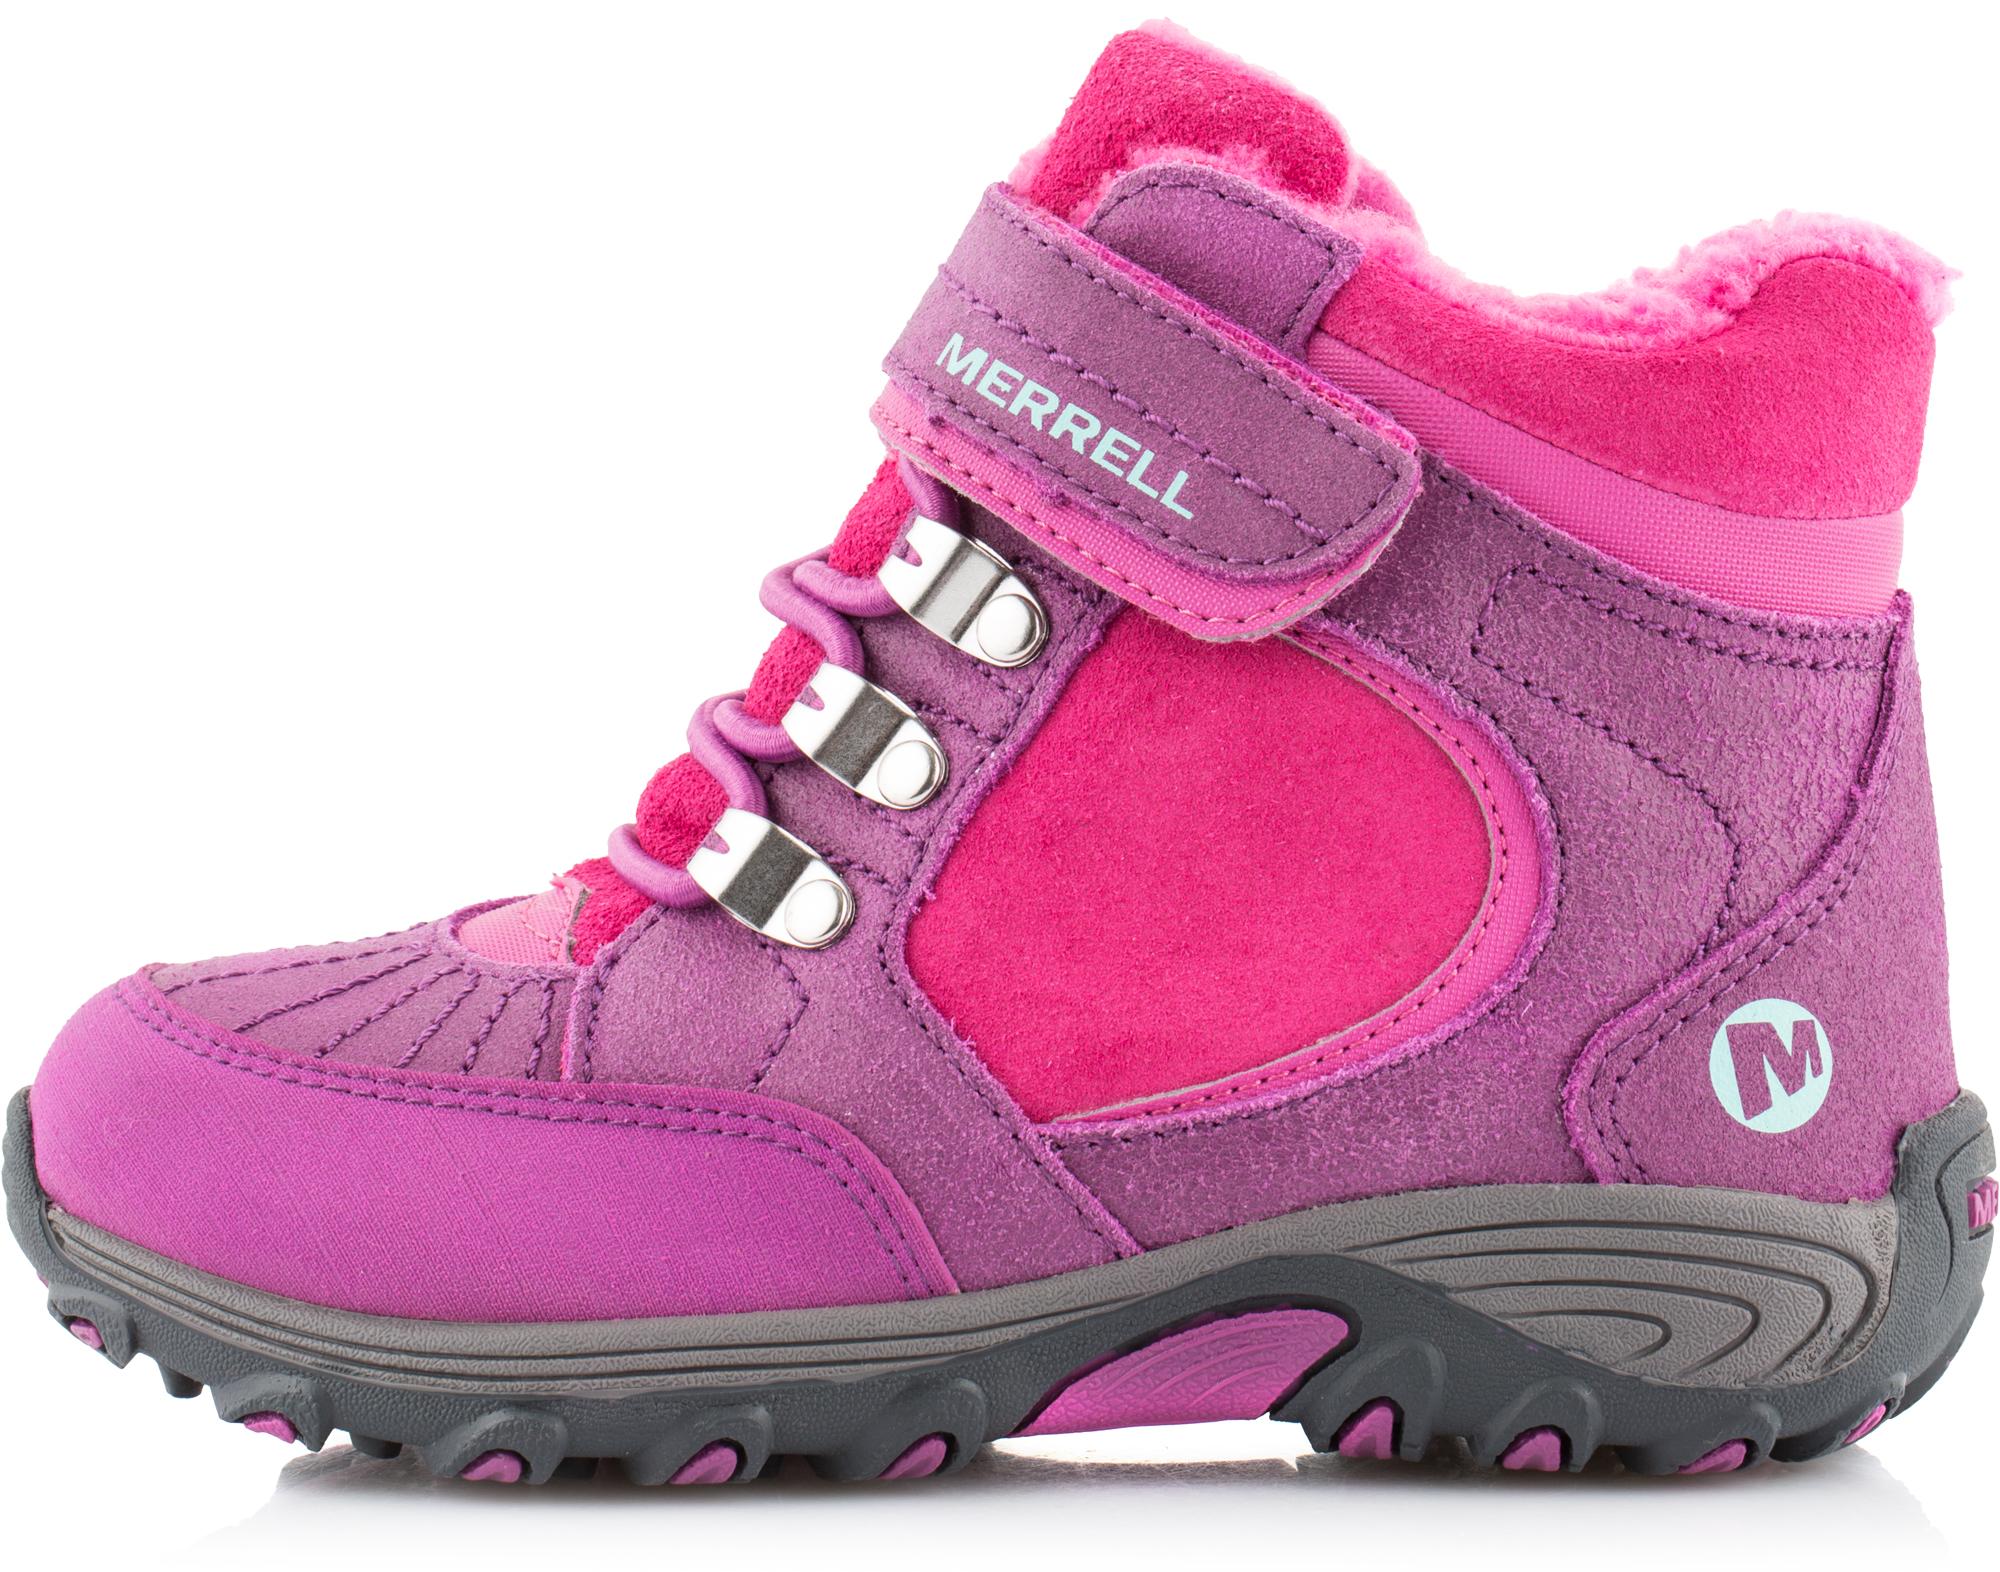 Merrell Ботинки утепленные для девочек Merrell Moab